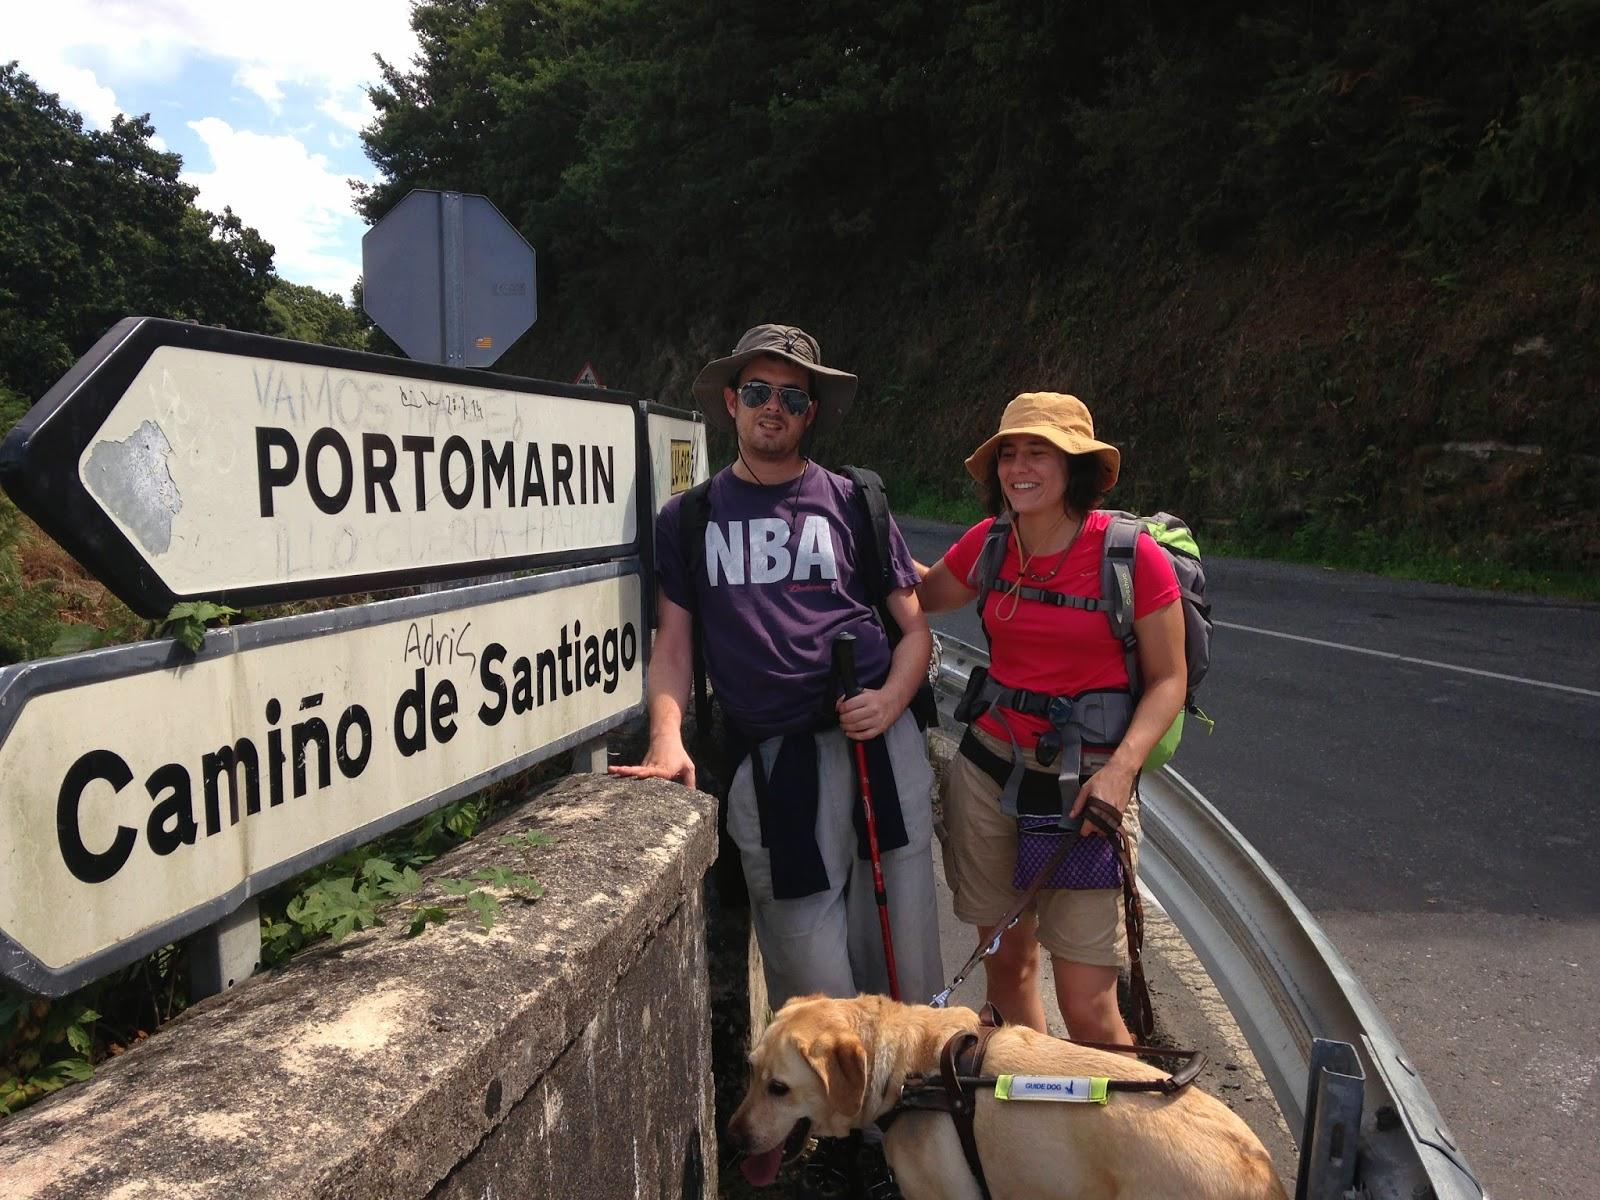 El cartel de Portomarin